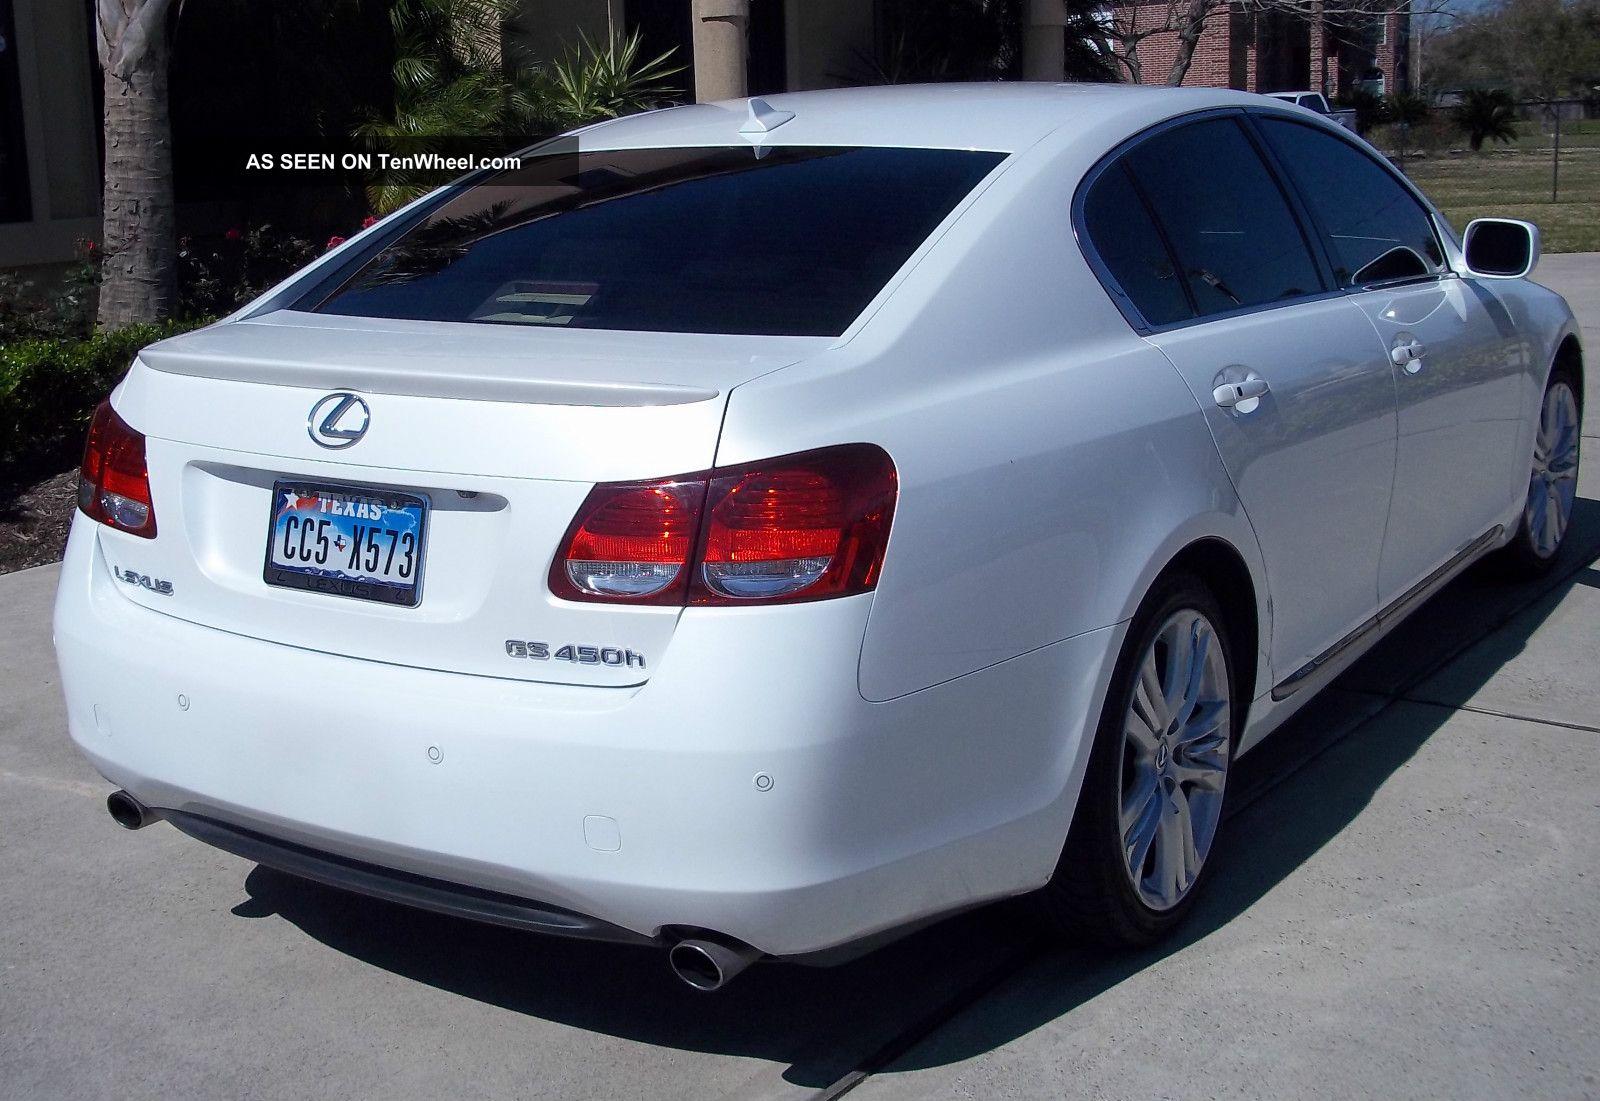 2007 Lexus Gs450h Starfire Pearl White In